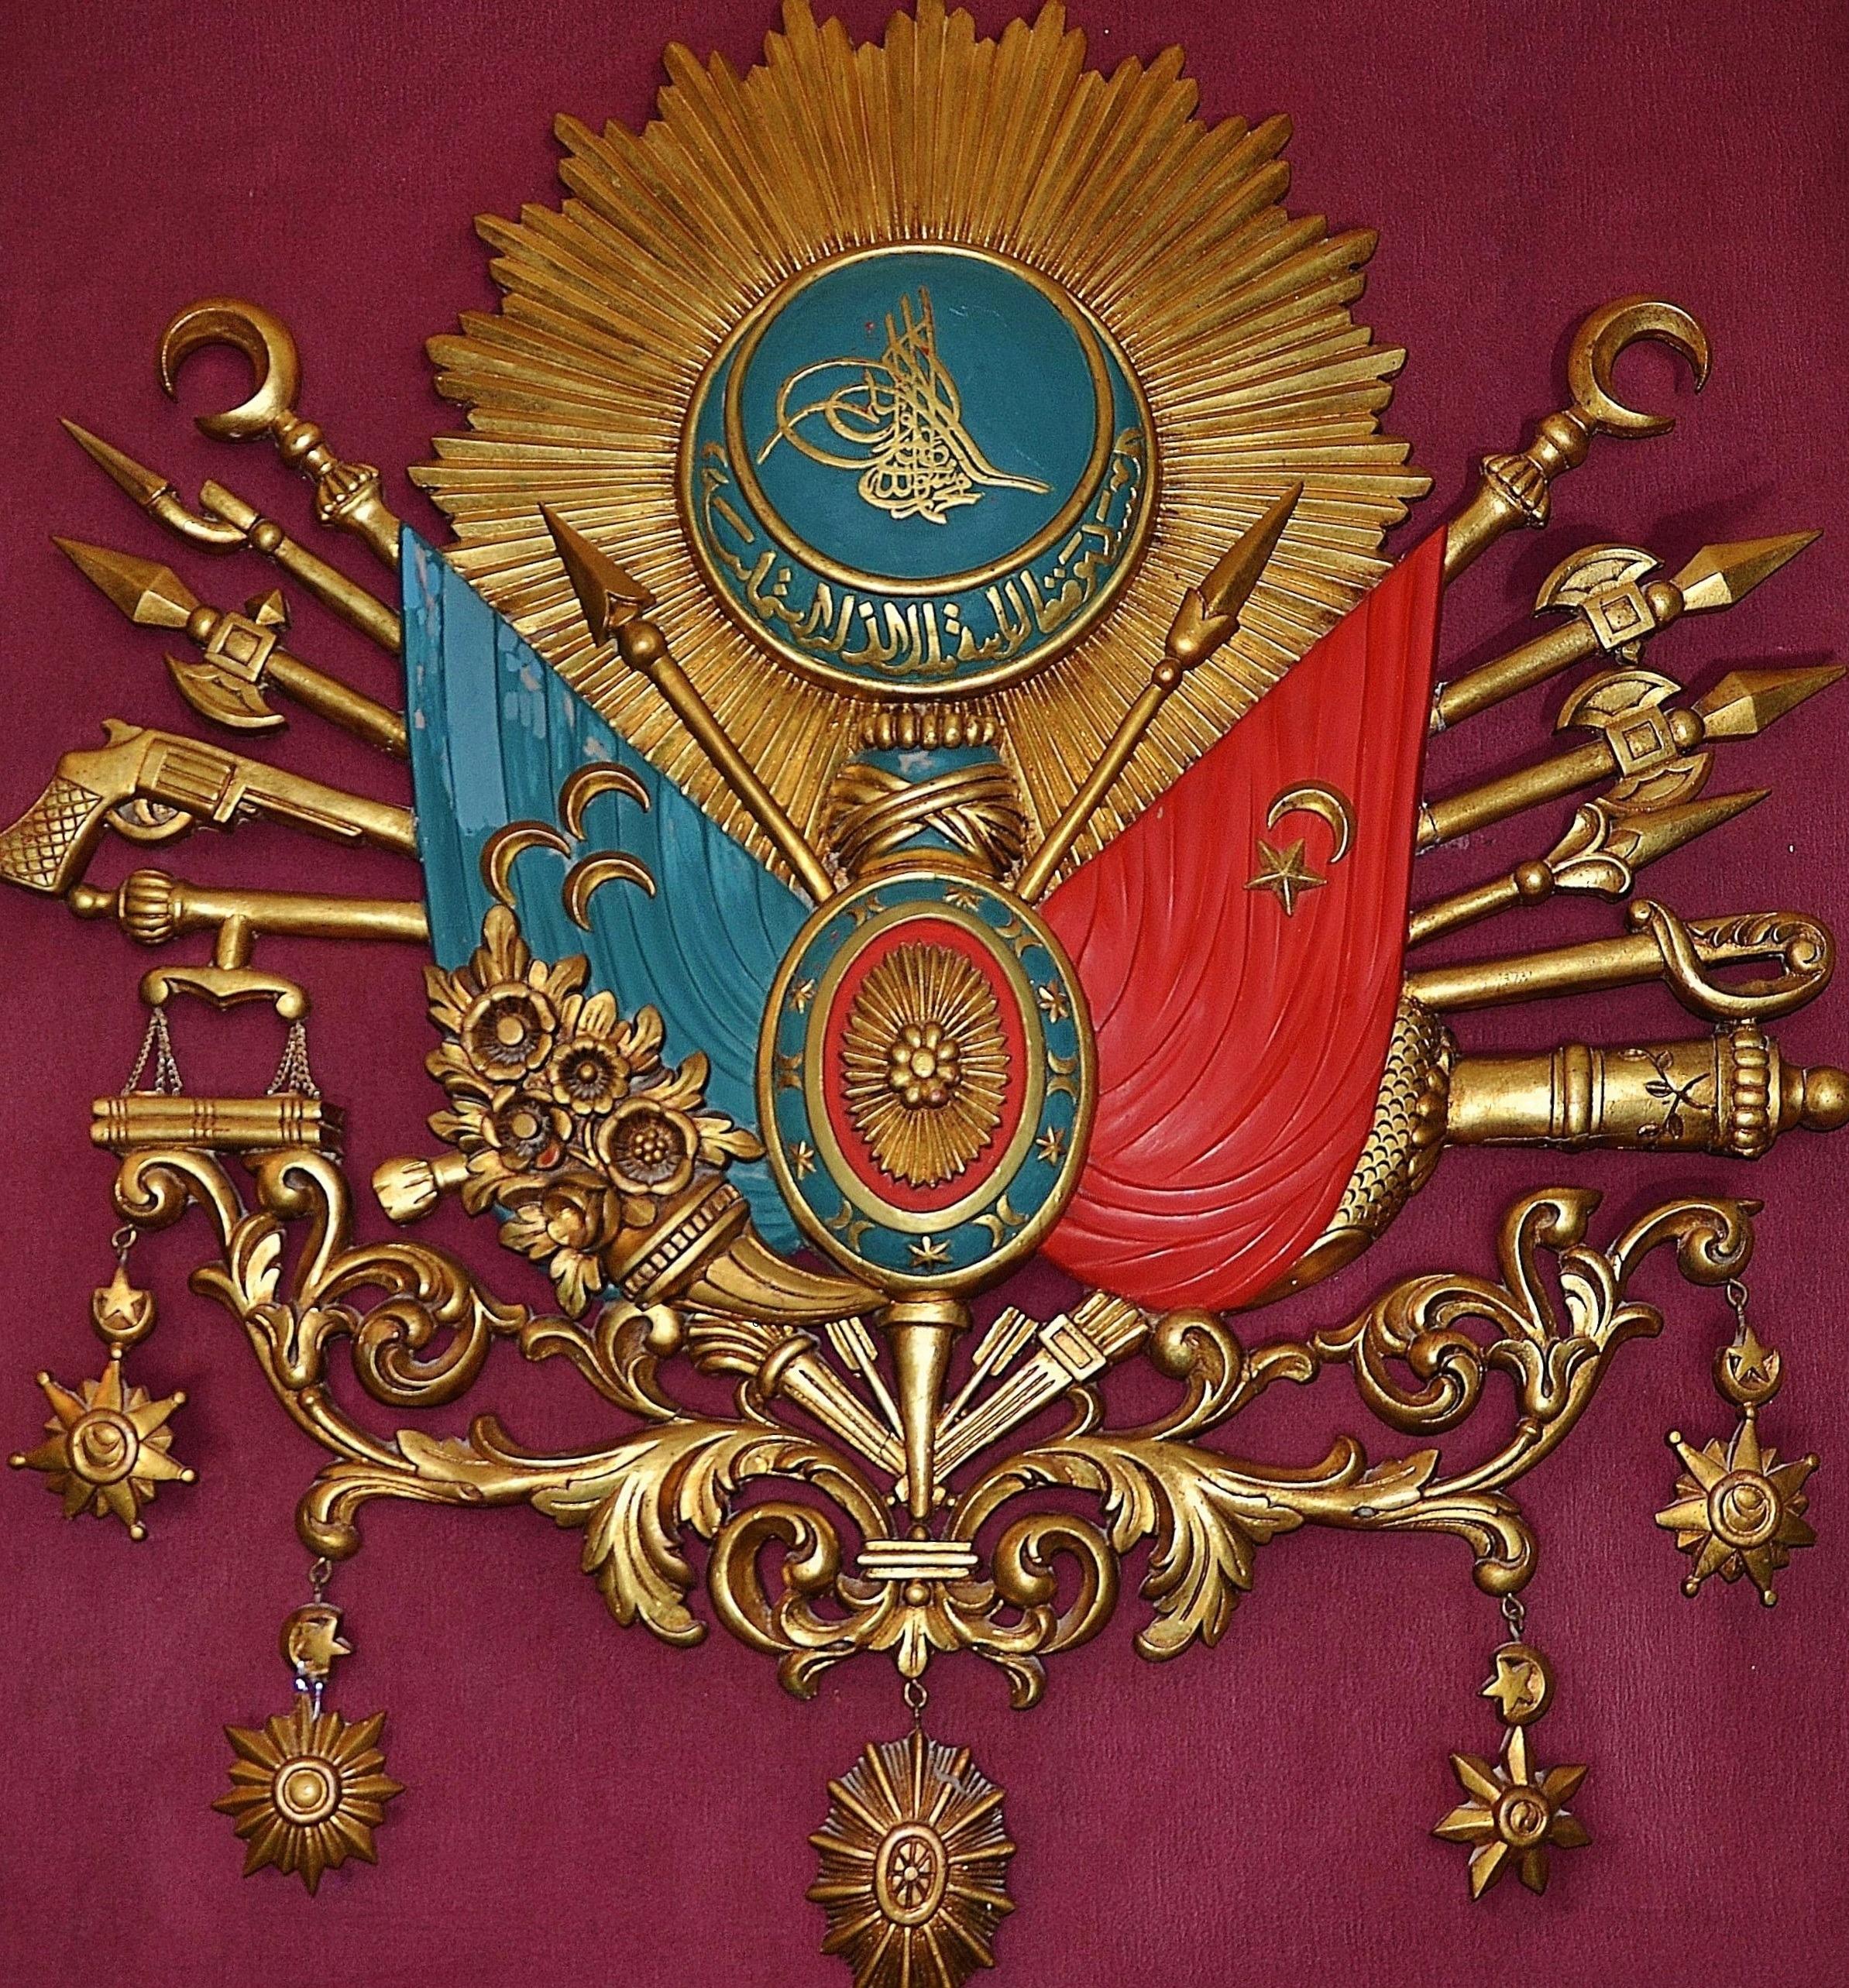 Free Images Country Symbol Historic Emblem Crown Font